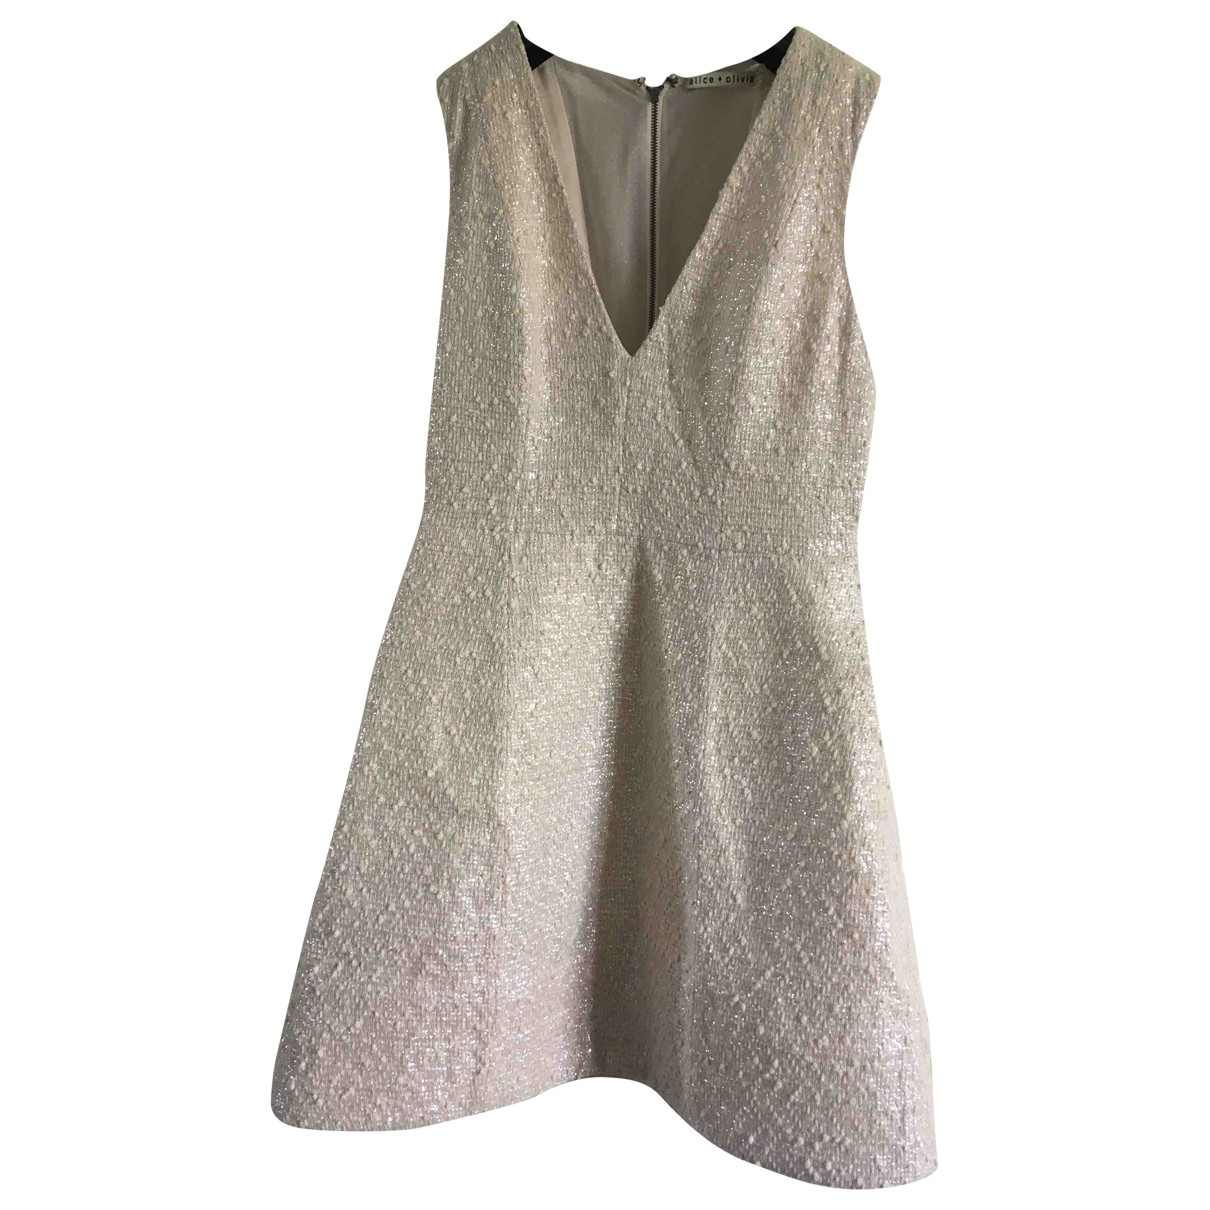 Alice & Olivia \N Beige Cotton dress for Women 8 UK